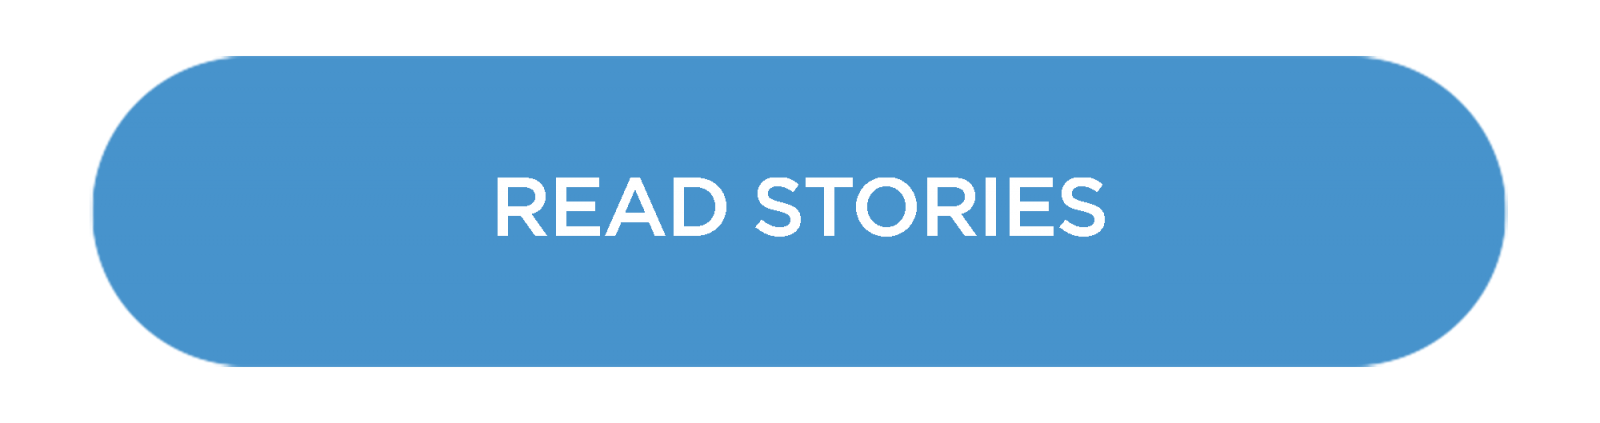 Read Stories CTA